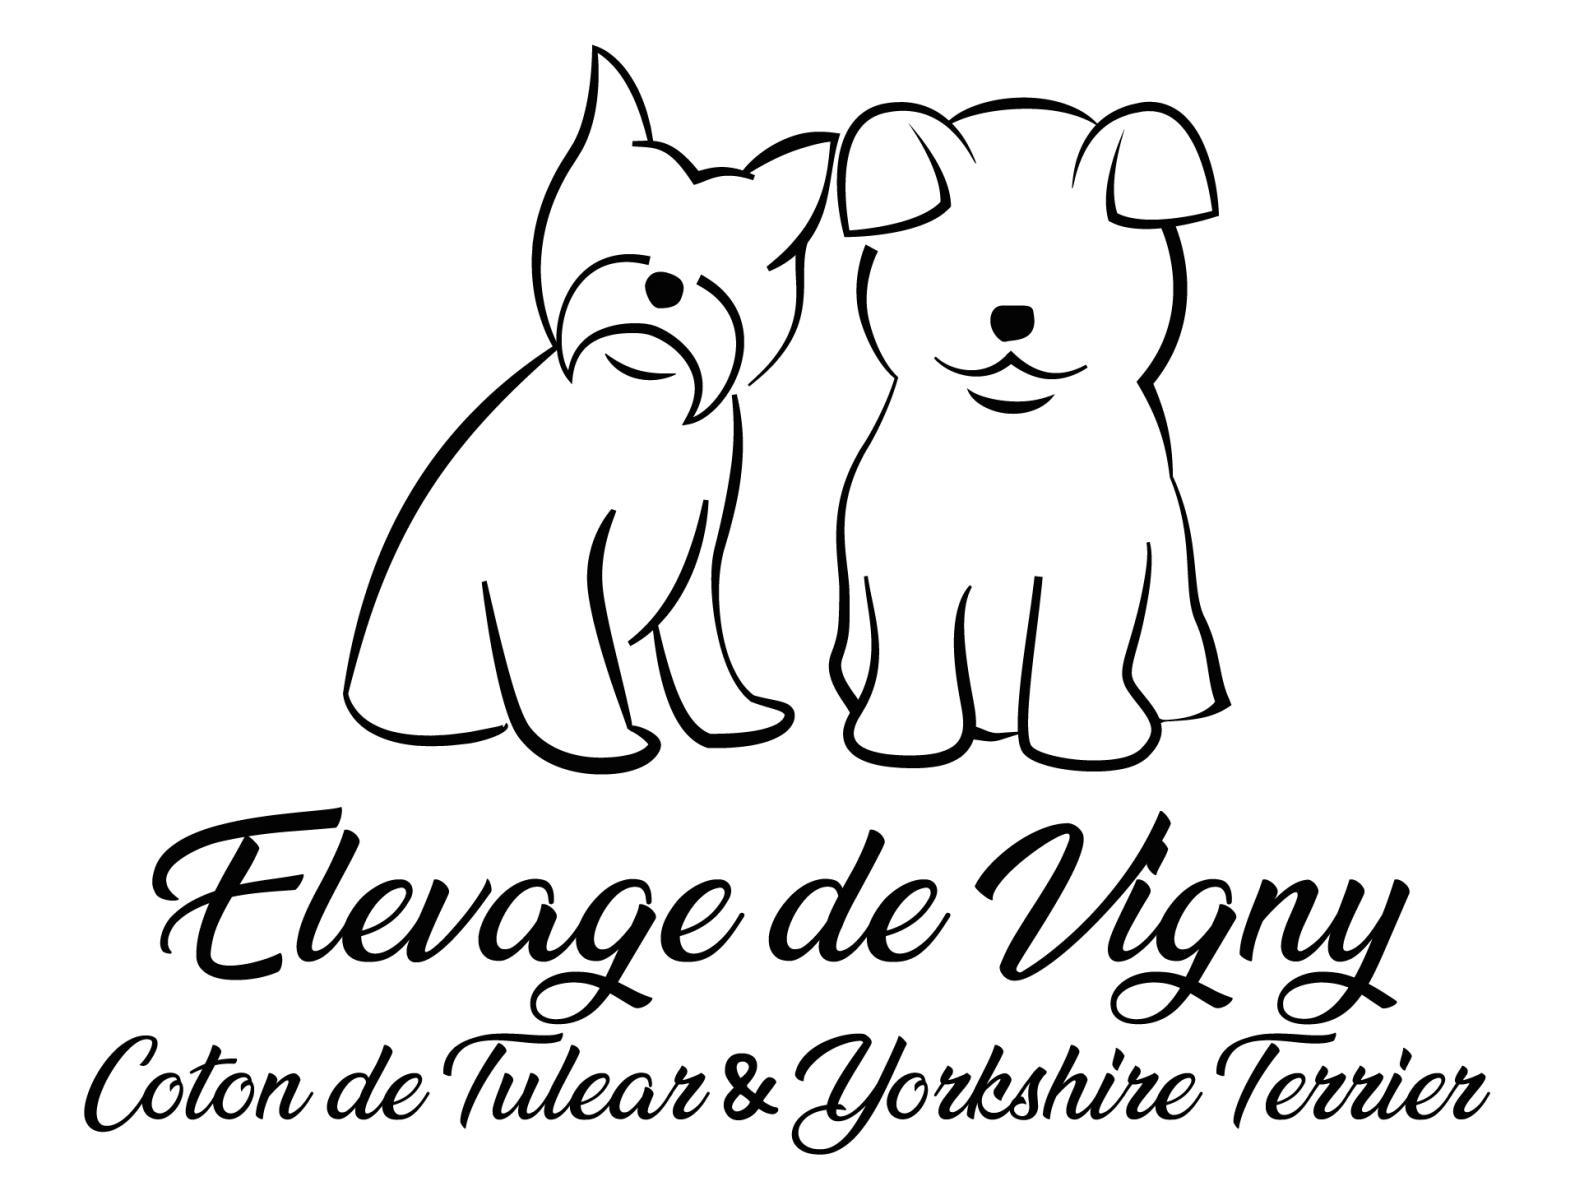 De La Maison Vigny